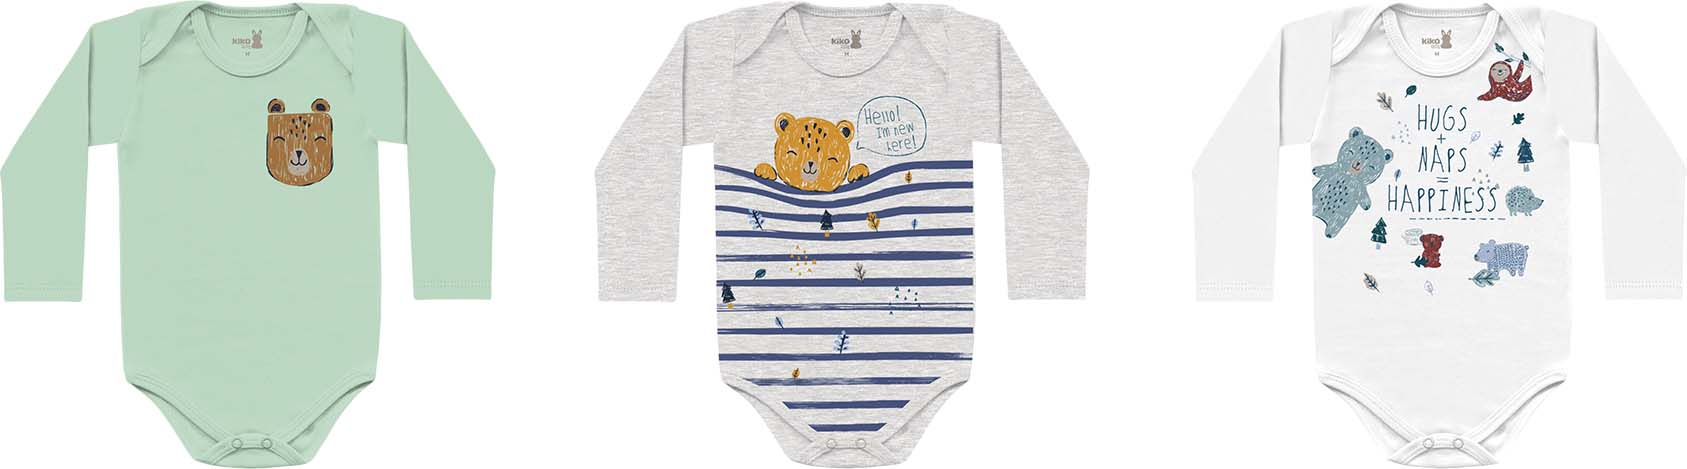 Kit Body Manga Longa Suedine Com 3 Peças Bicho Preguiça Branco/Urso Mescla/ Urso Verde Kiko Baby